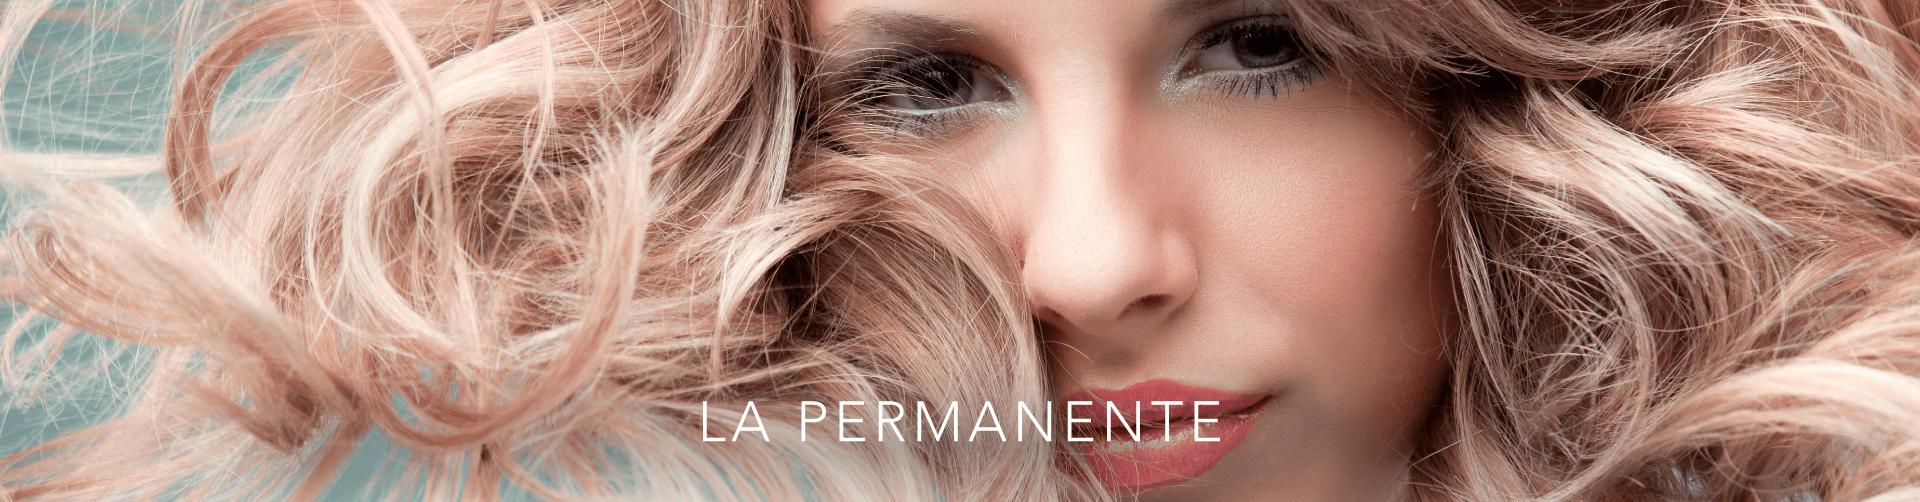 Permanente class=